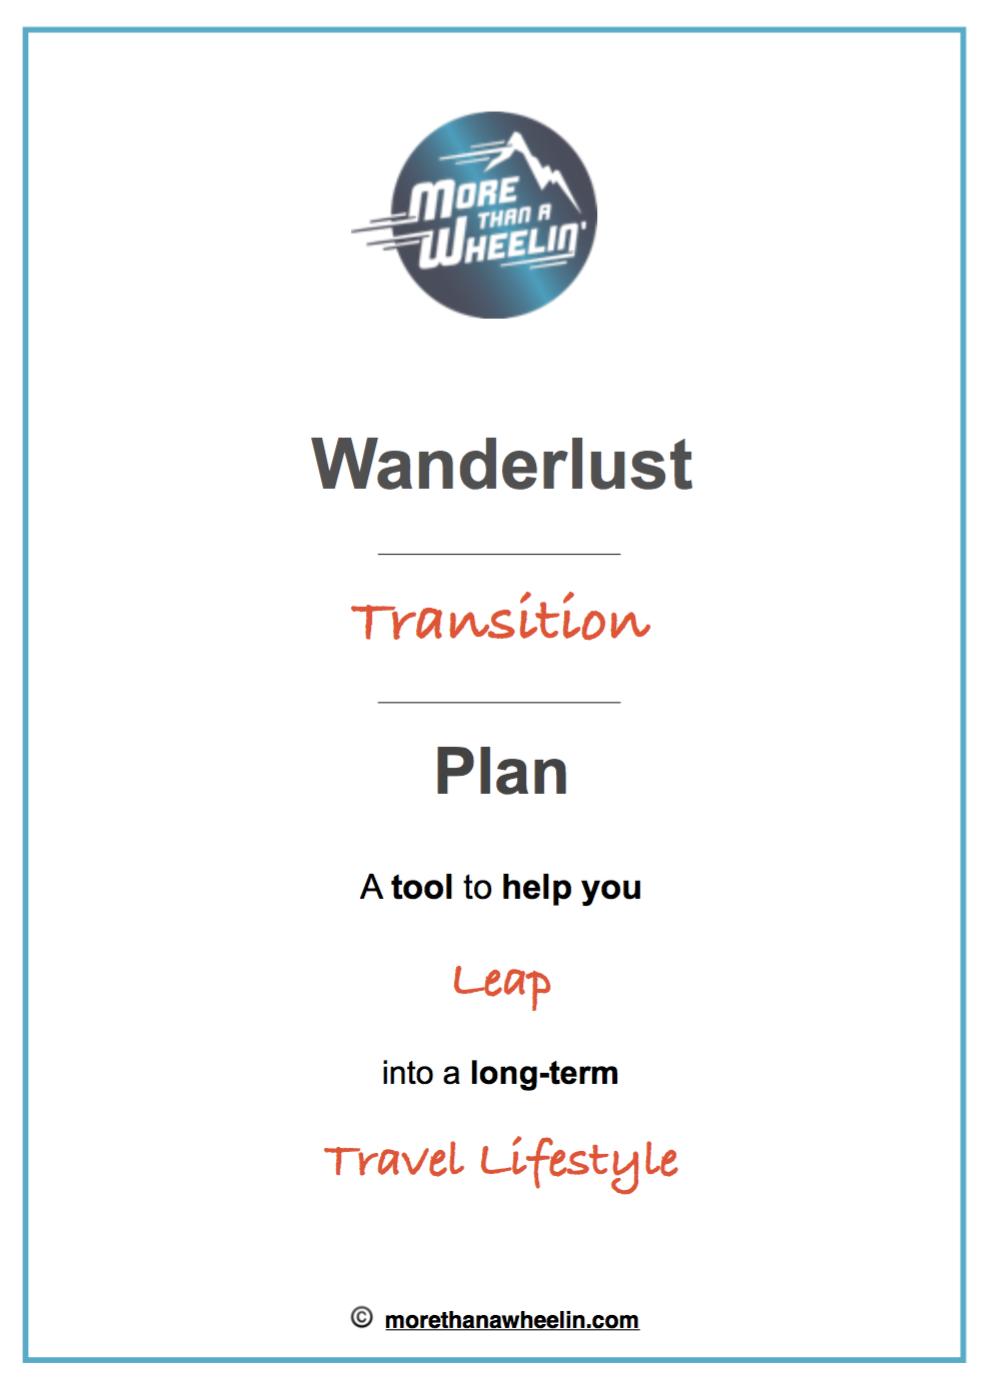 Wanderlust Transition Plan